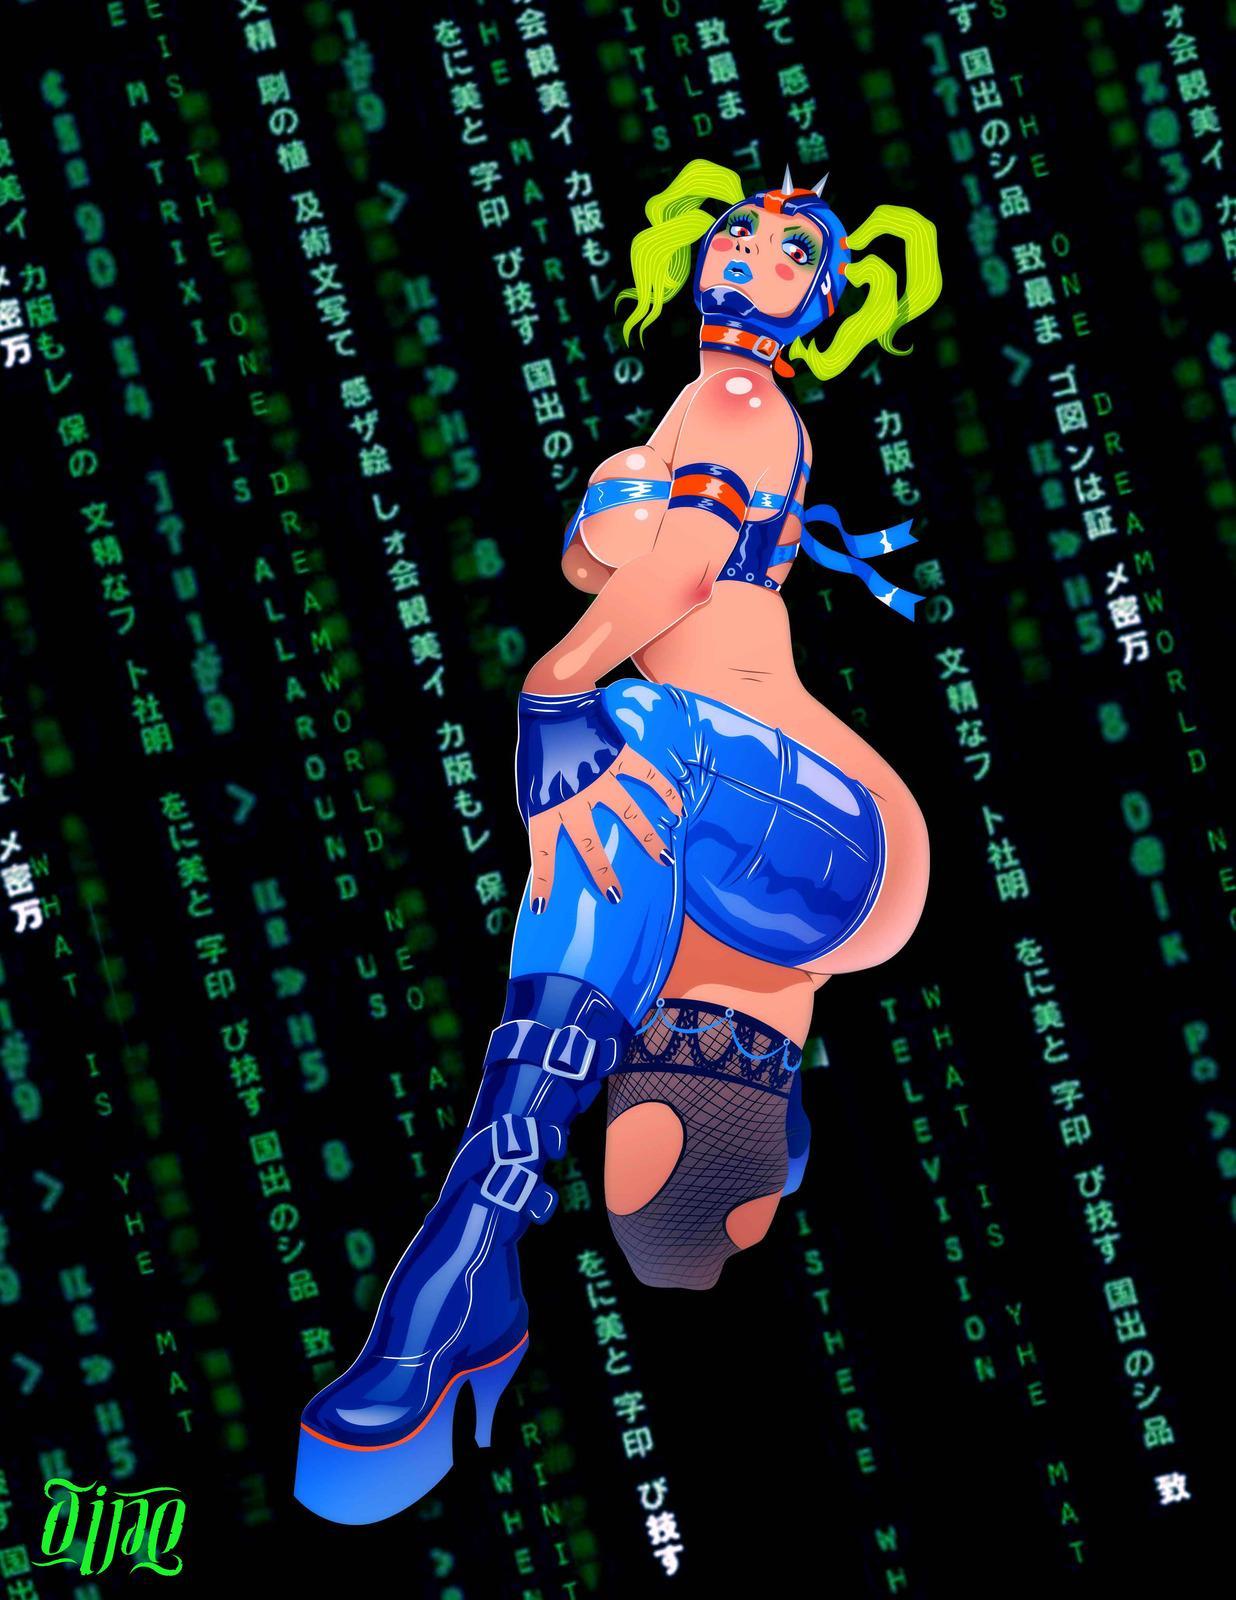 Cyber Girl by Don_Tello - CGHUB